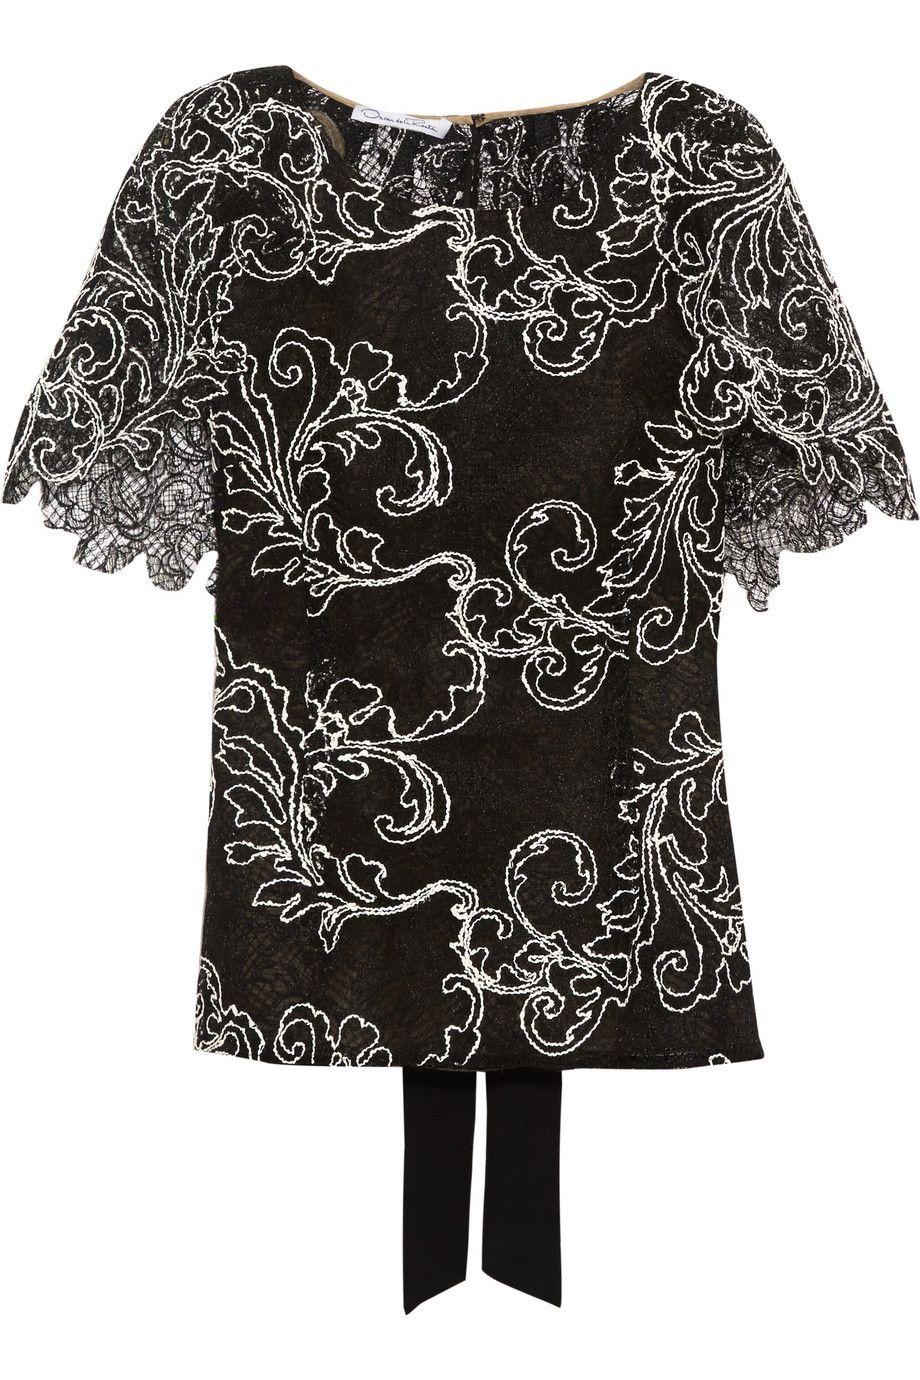 OSCAR DE LA RENTA Cape-Effect Guipere Lace Top. #oscardelarenta #cloth #top